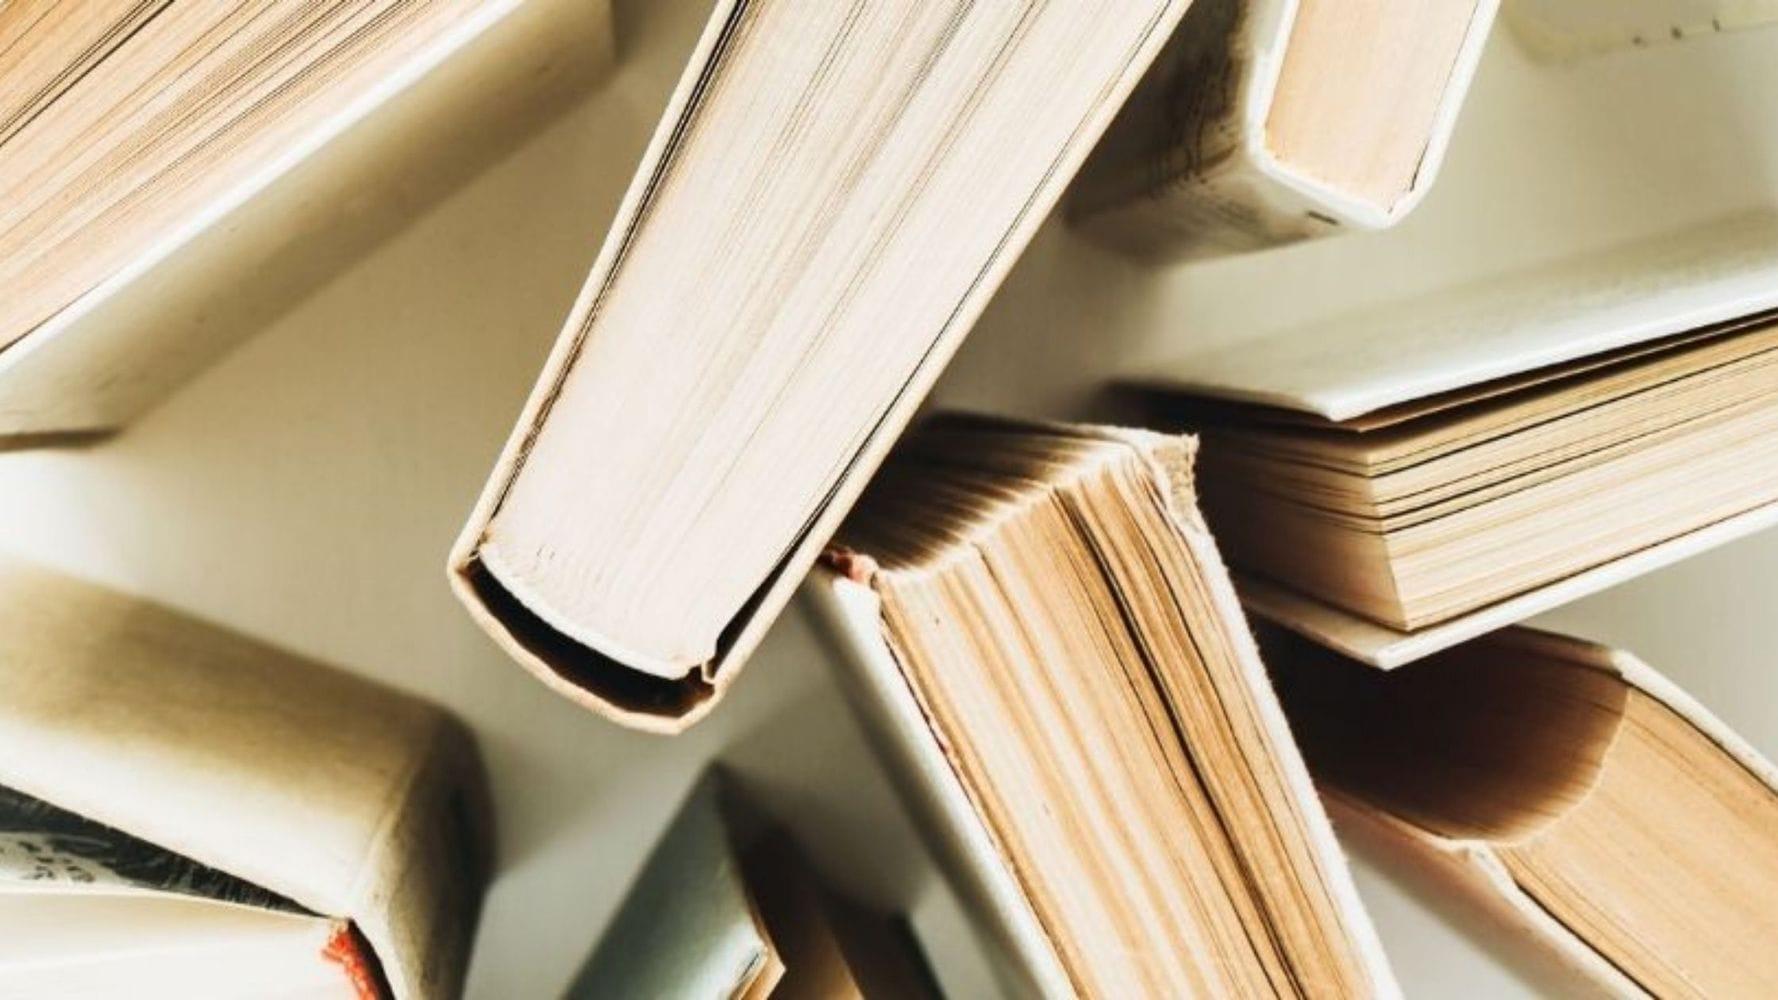 Books at Chandler Nazarene